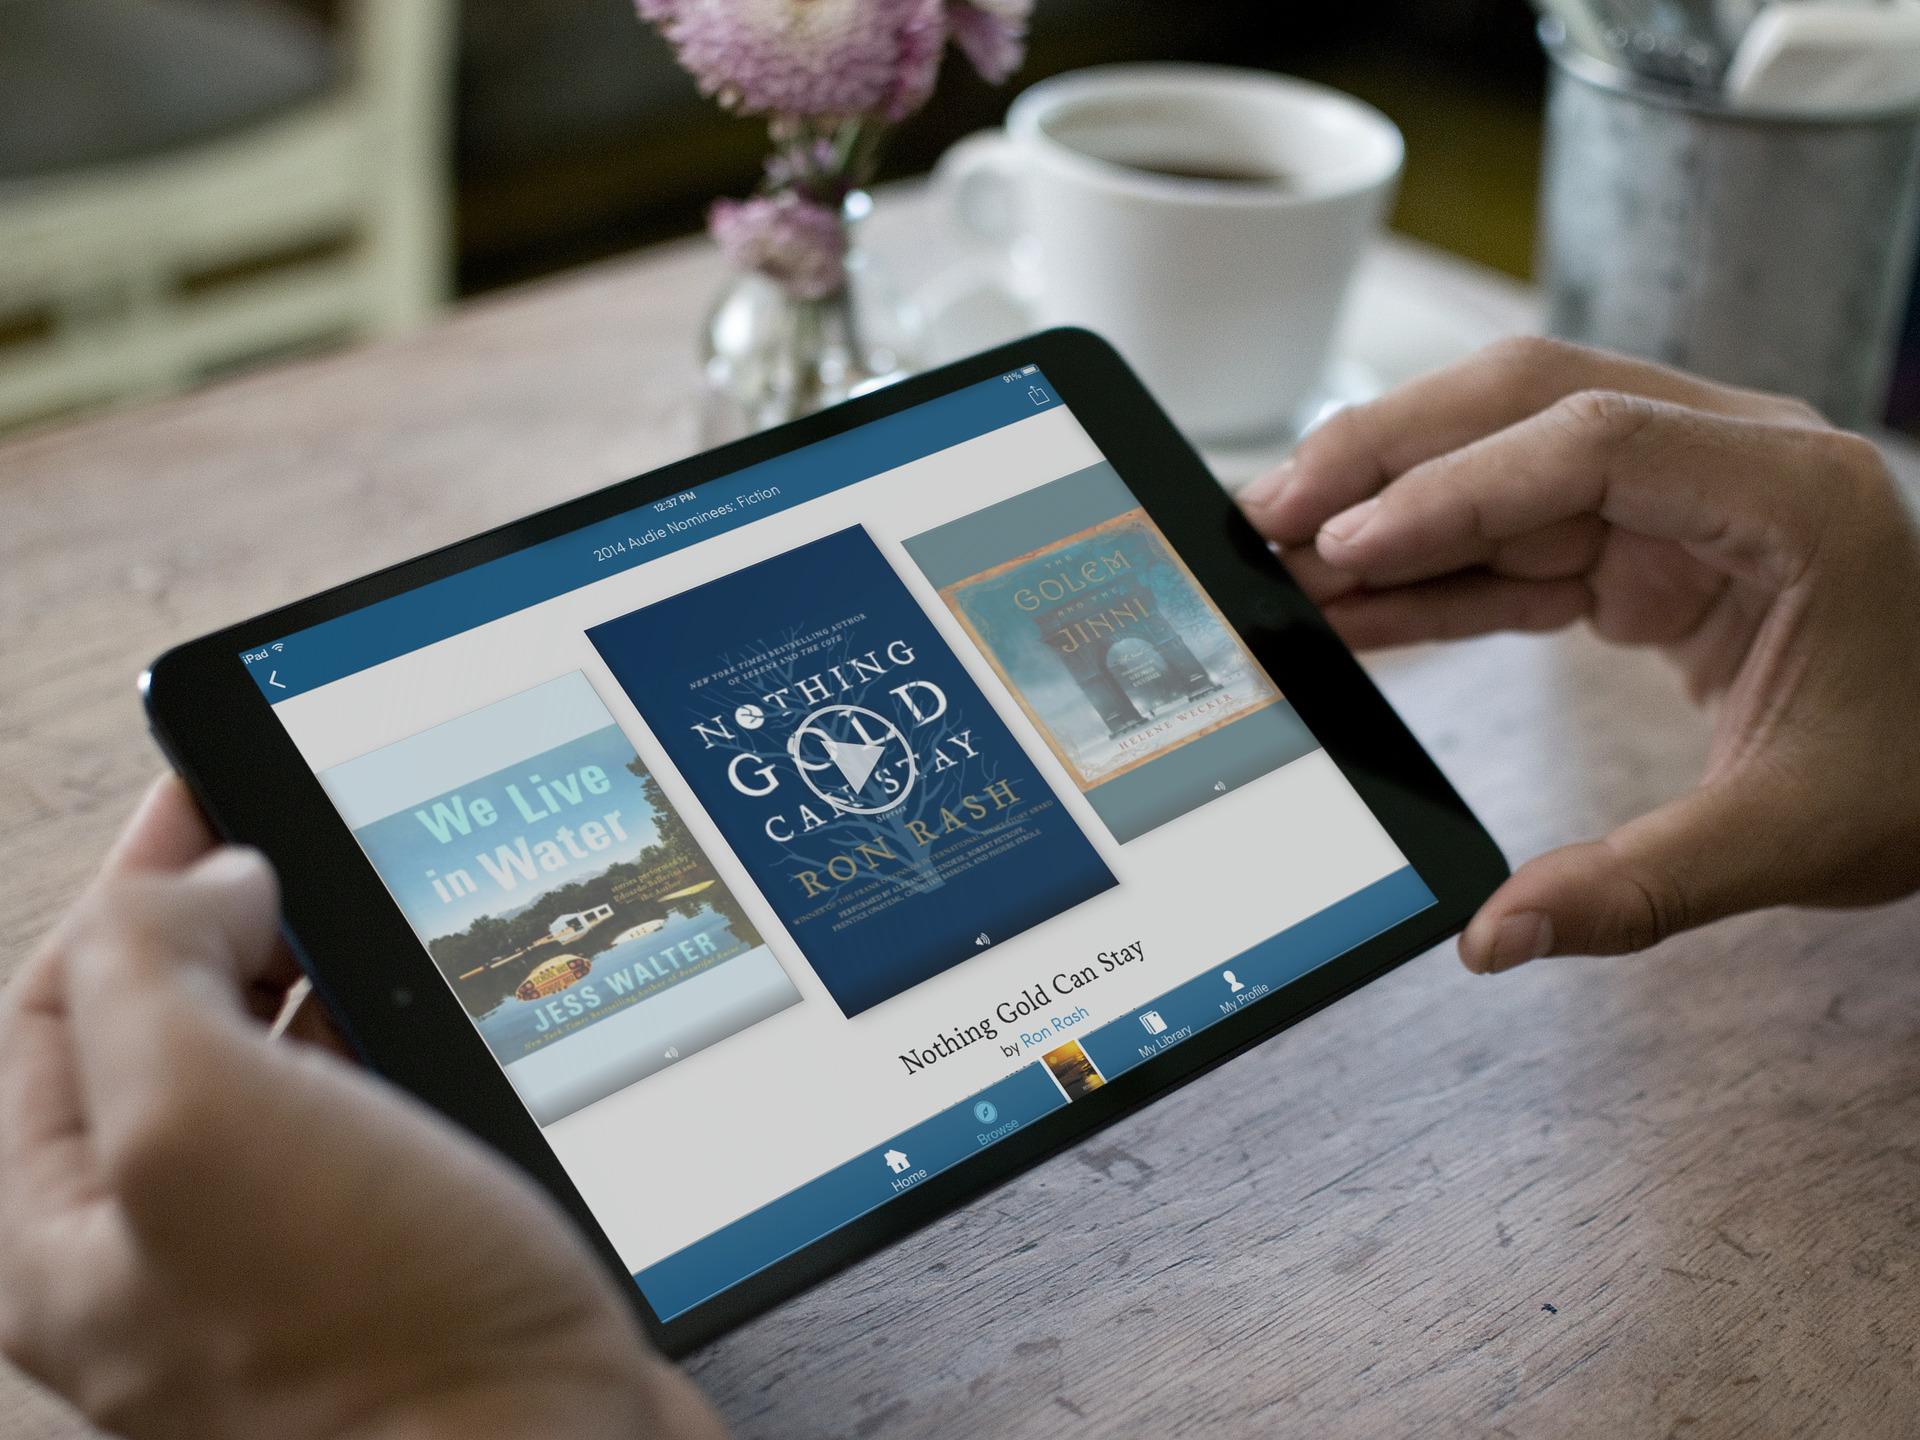 how to create kindle ebook